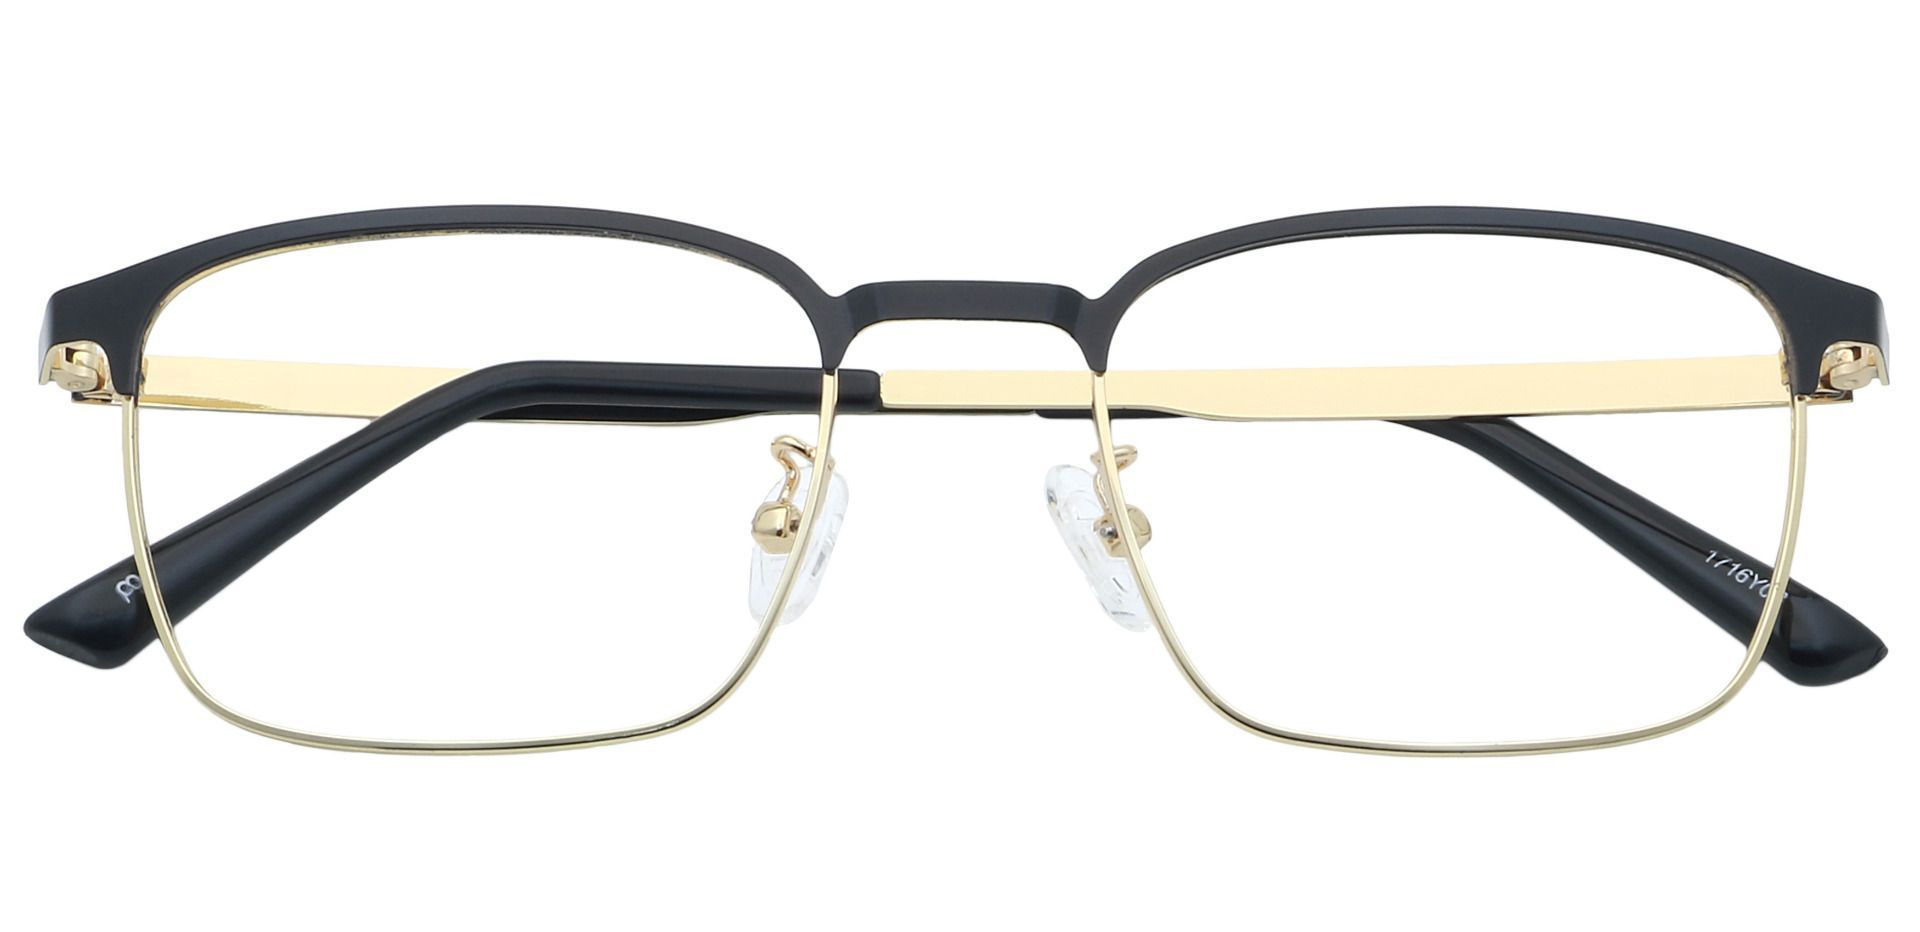 Kingston Square Prescription Glasses - Yellow